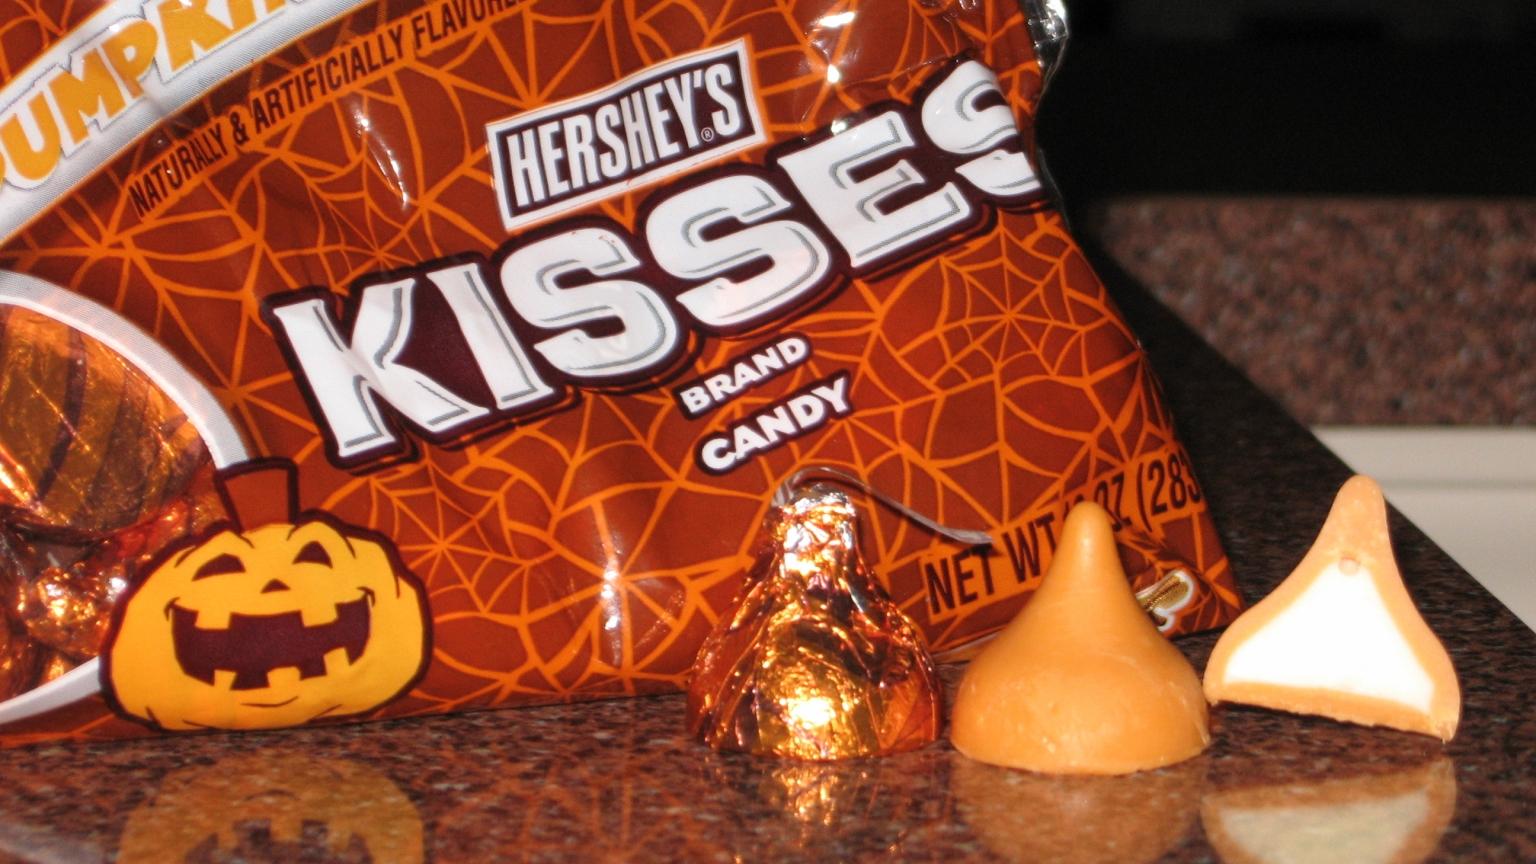 download Hershey Kisses Wallpaper Spice hershey kisses 1536x864